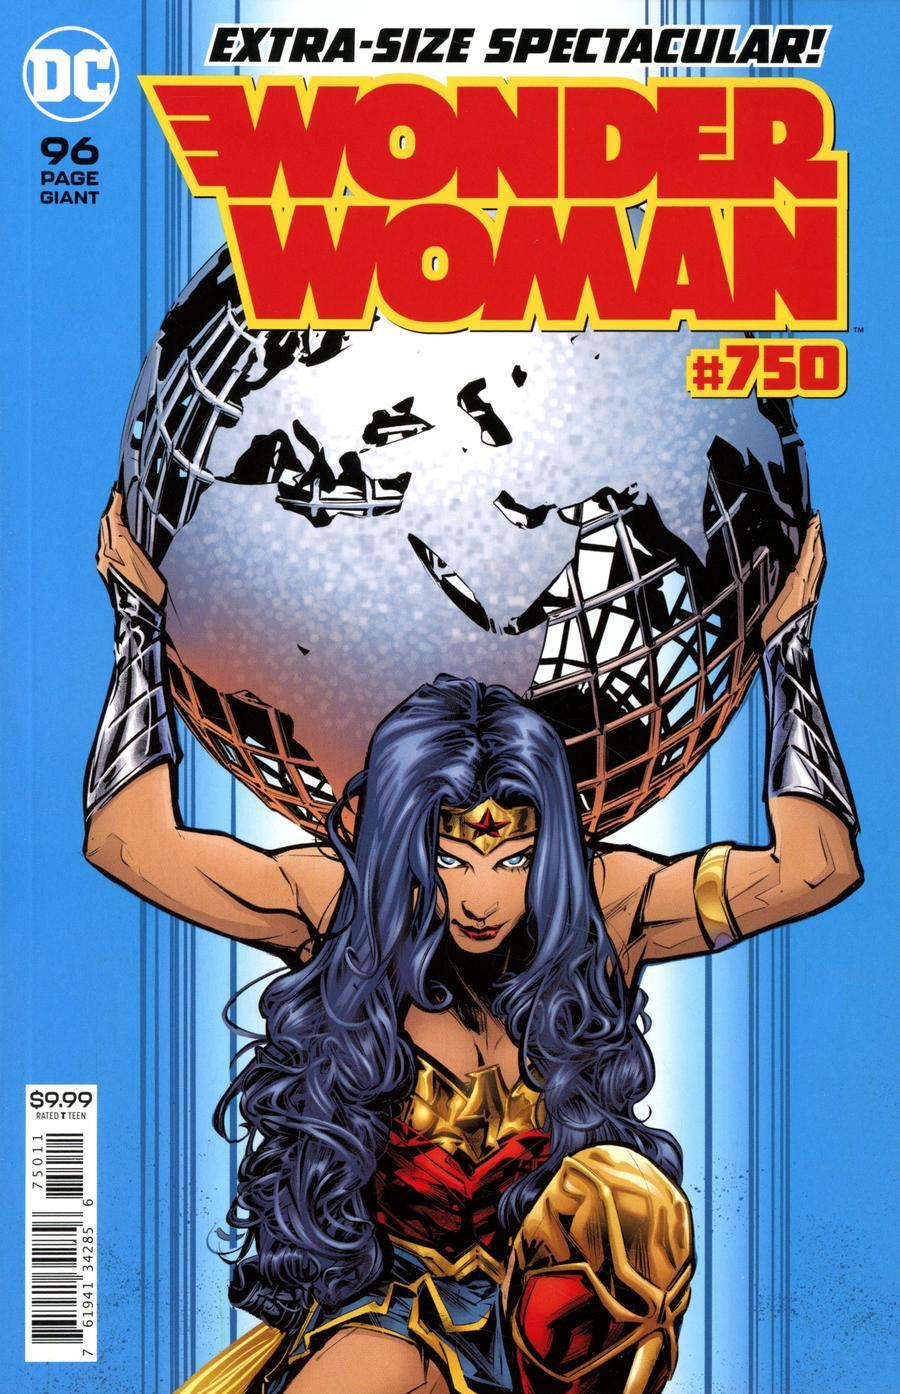 Wonder Woman Vol 5 #750 Cover A Regular Joelle Jones Cover